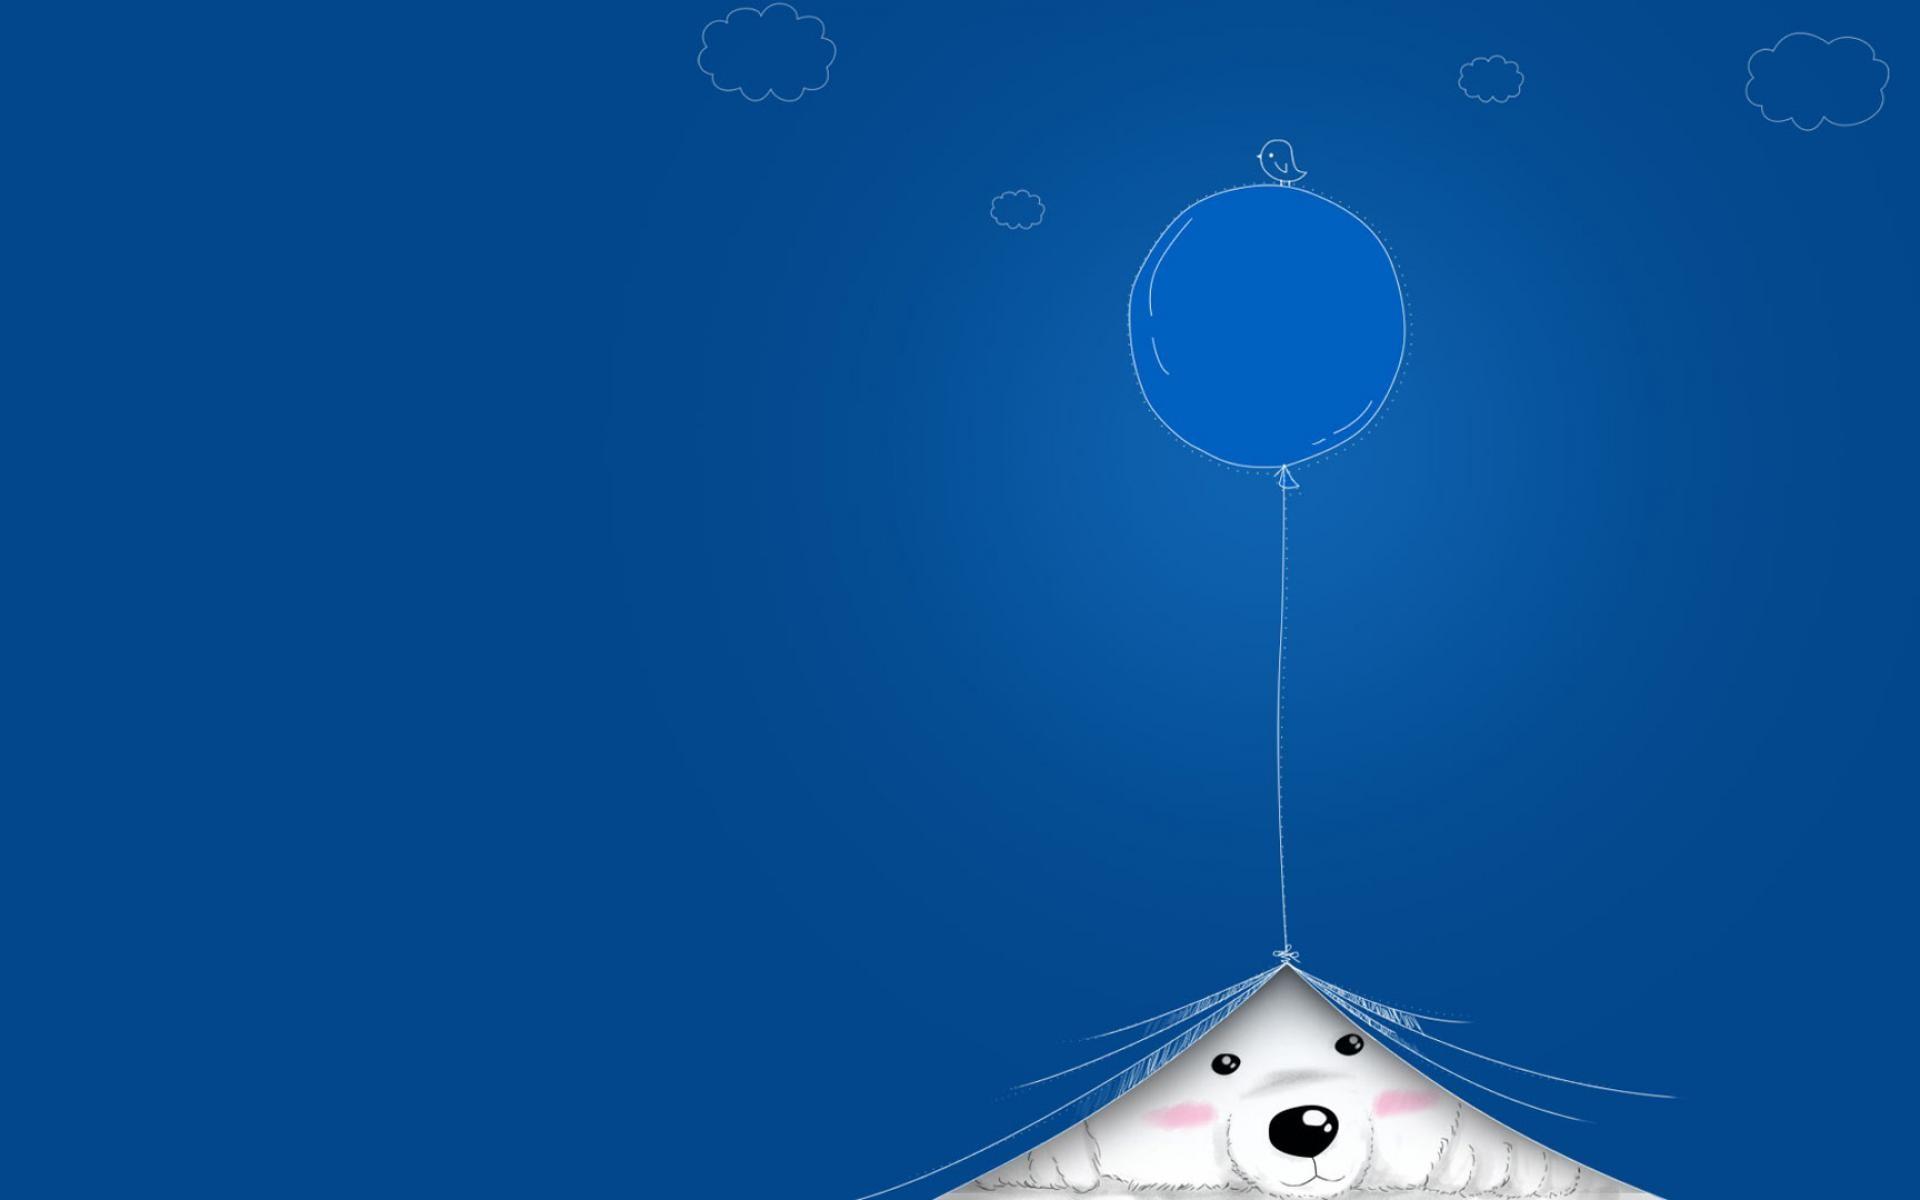 Black Background Tumblr Download Free Wallpapers For: Blue Background Tumblr ·① Download Free Amazing High